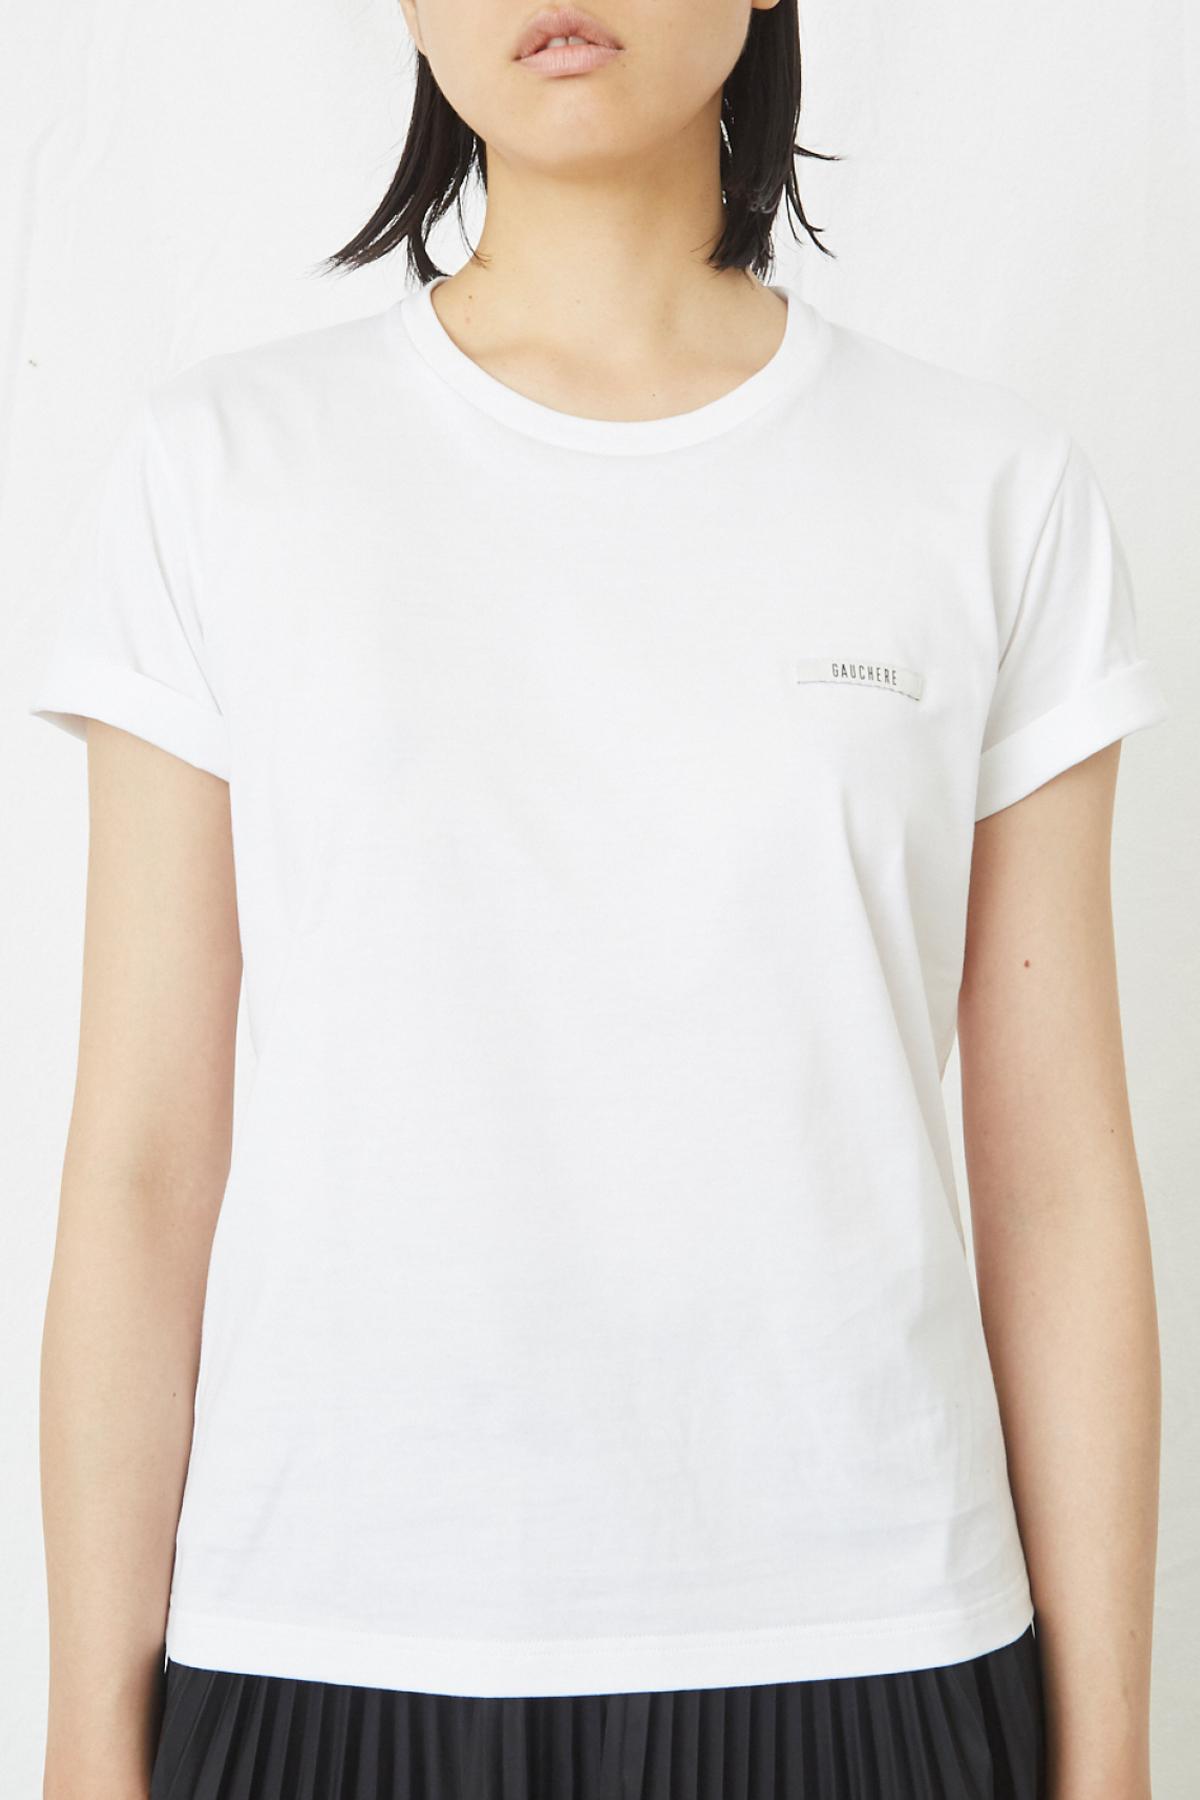 T-SHIRT SHEINA WHITE